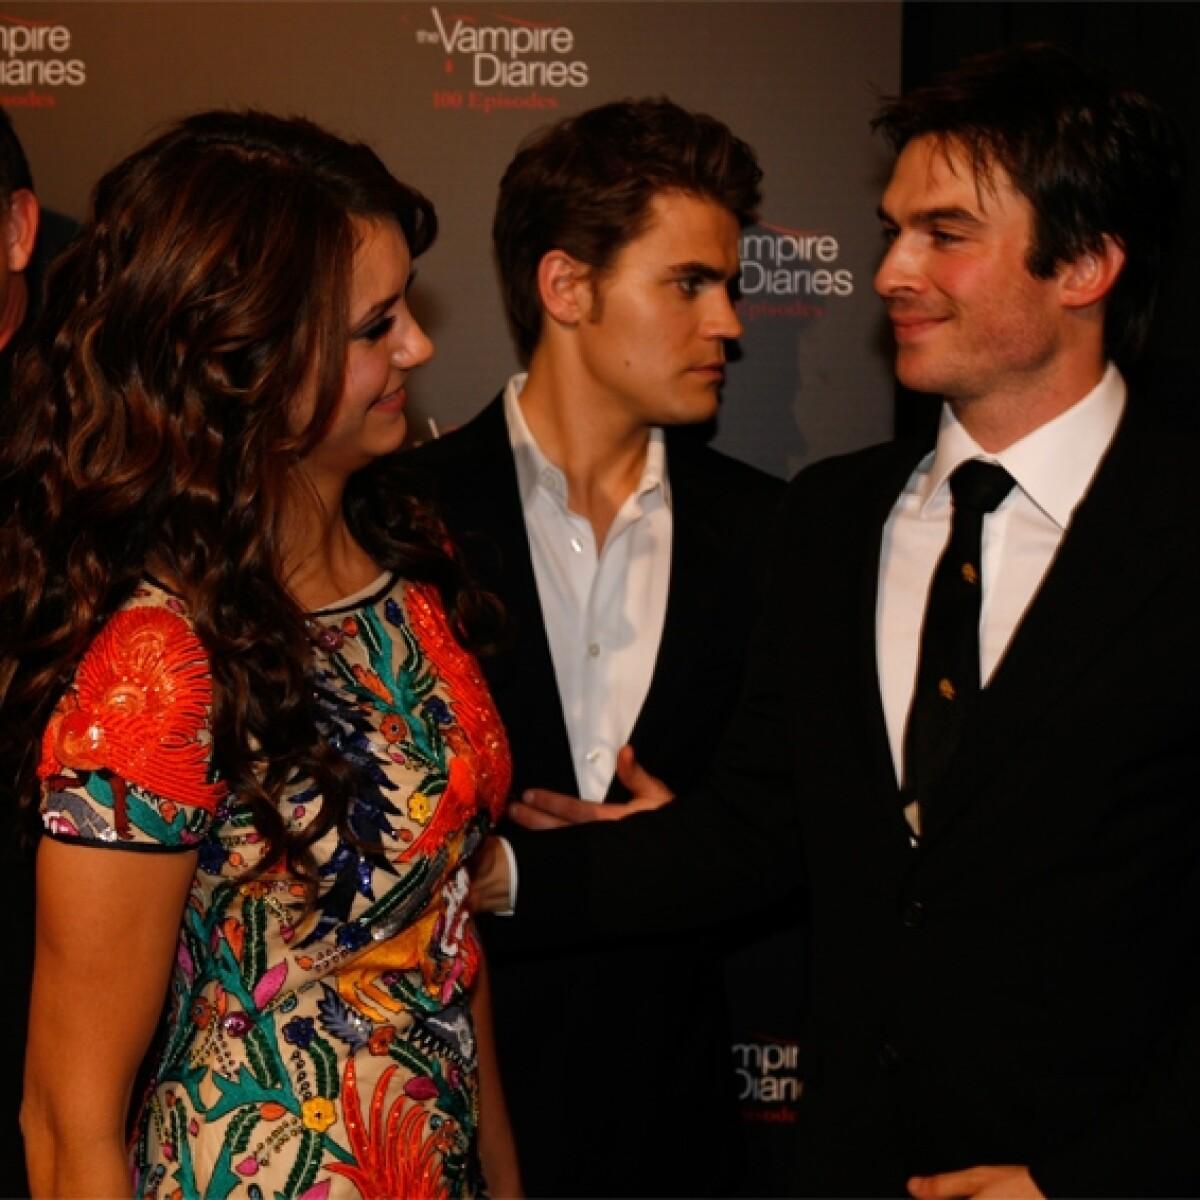 Tras romper con Derek, Nina ve a Ian en fiesta de The Vampire Diaries